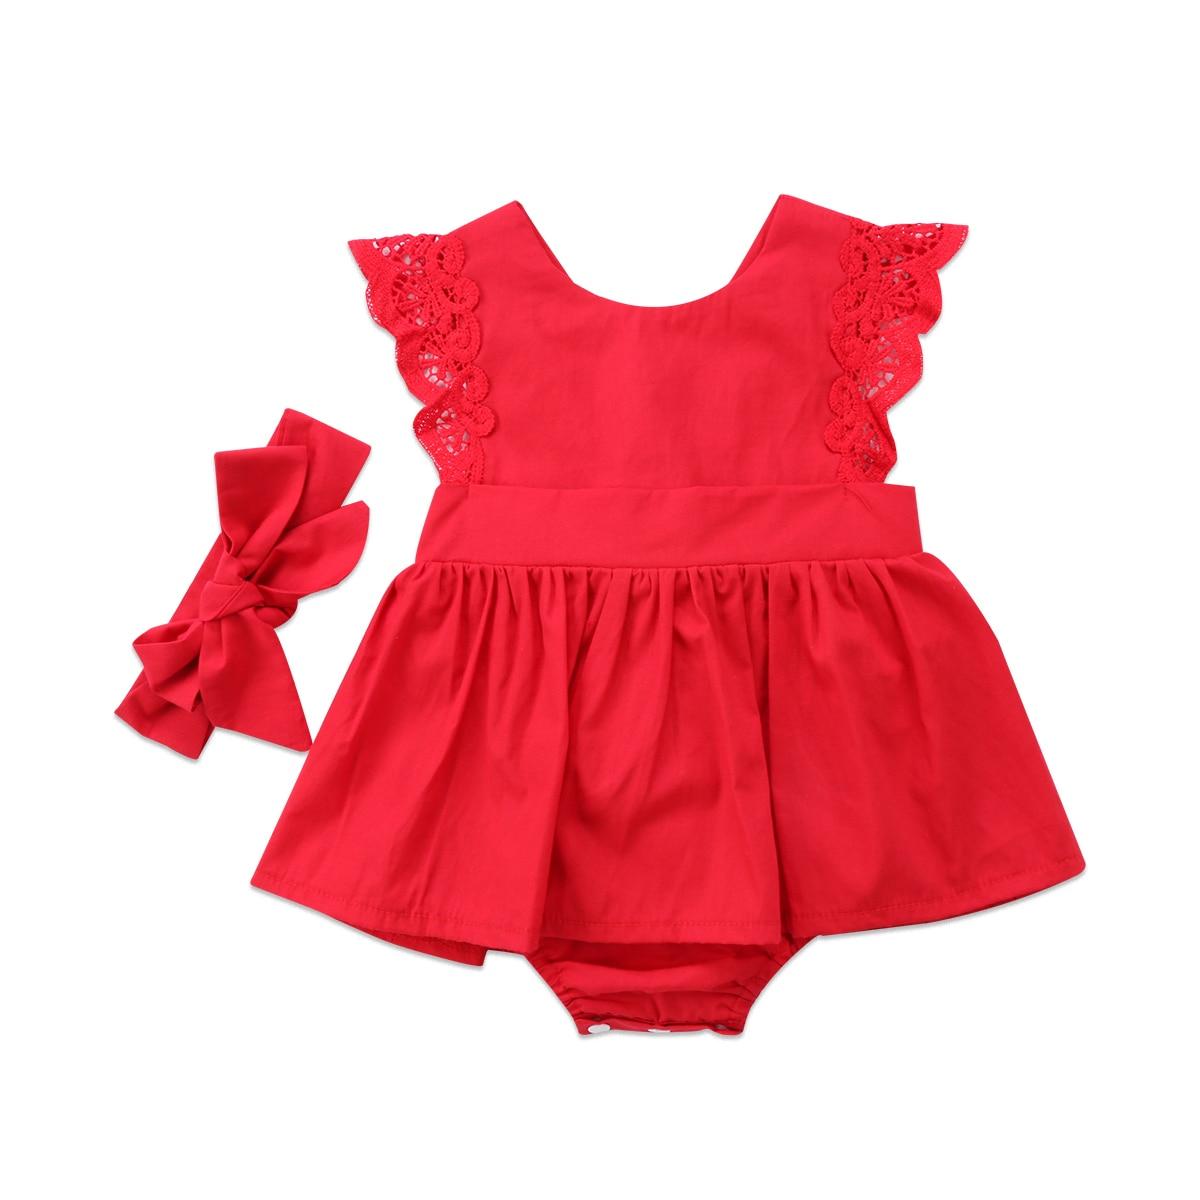 0-24M Newborn Baby Ruffle Red Lace Romper Dress Baby Girls Sister Princess Kids Xmas Party Dresses Cotton Newborn Costume Clothe